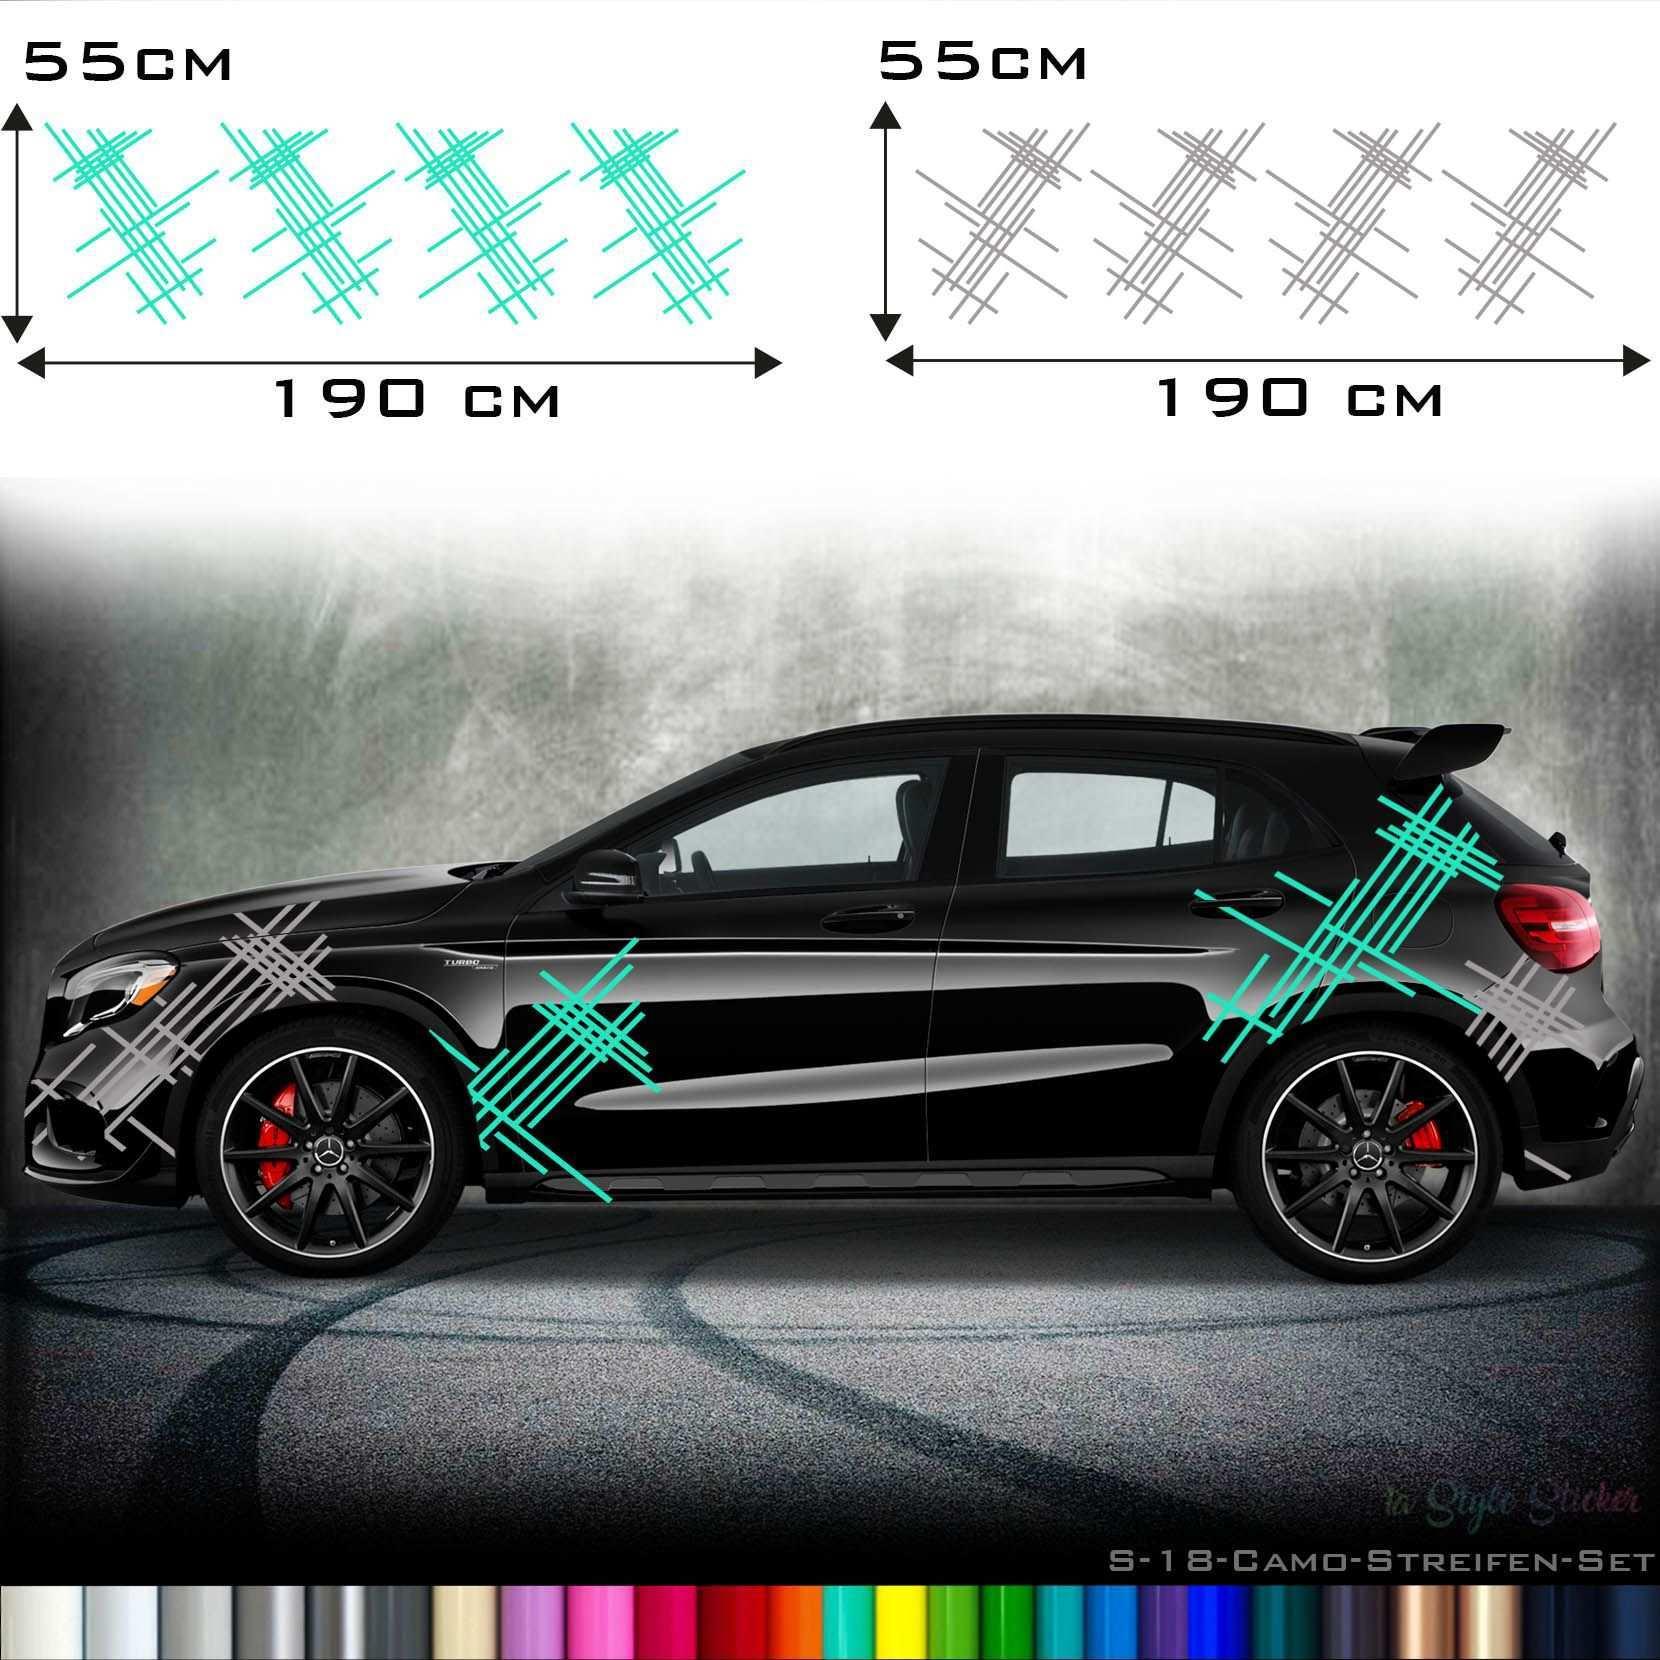 Seitenaufkleber Streifen Set Racing Dekor Aufkleber Auto Aufkleber Aufkleber Tuning Aufkleber